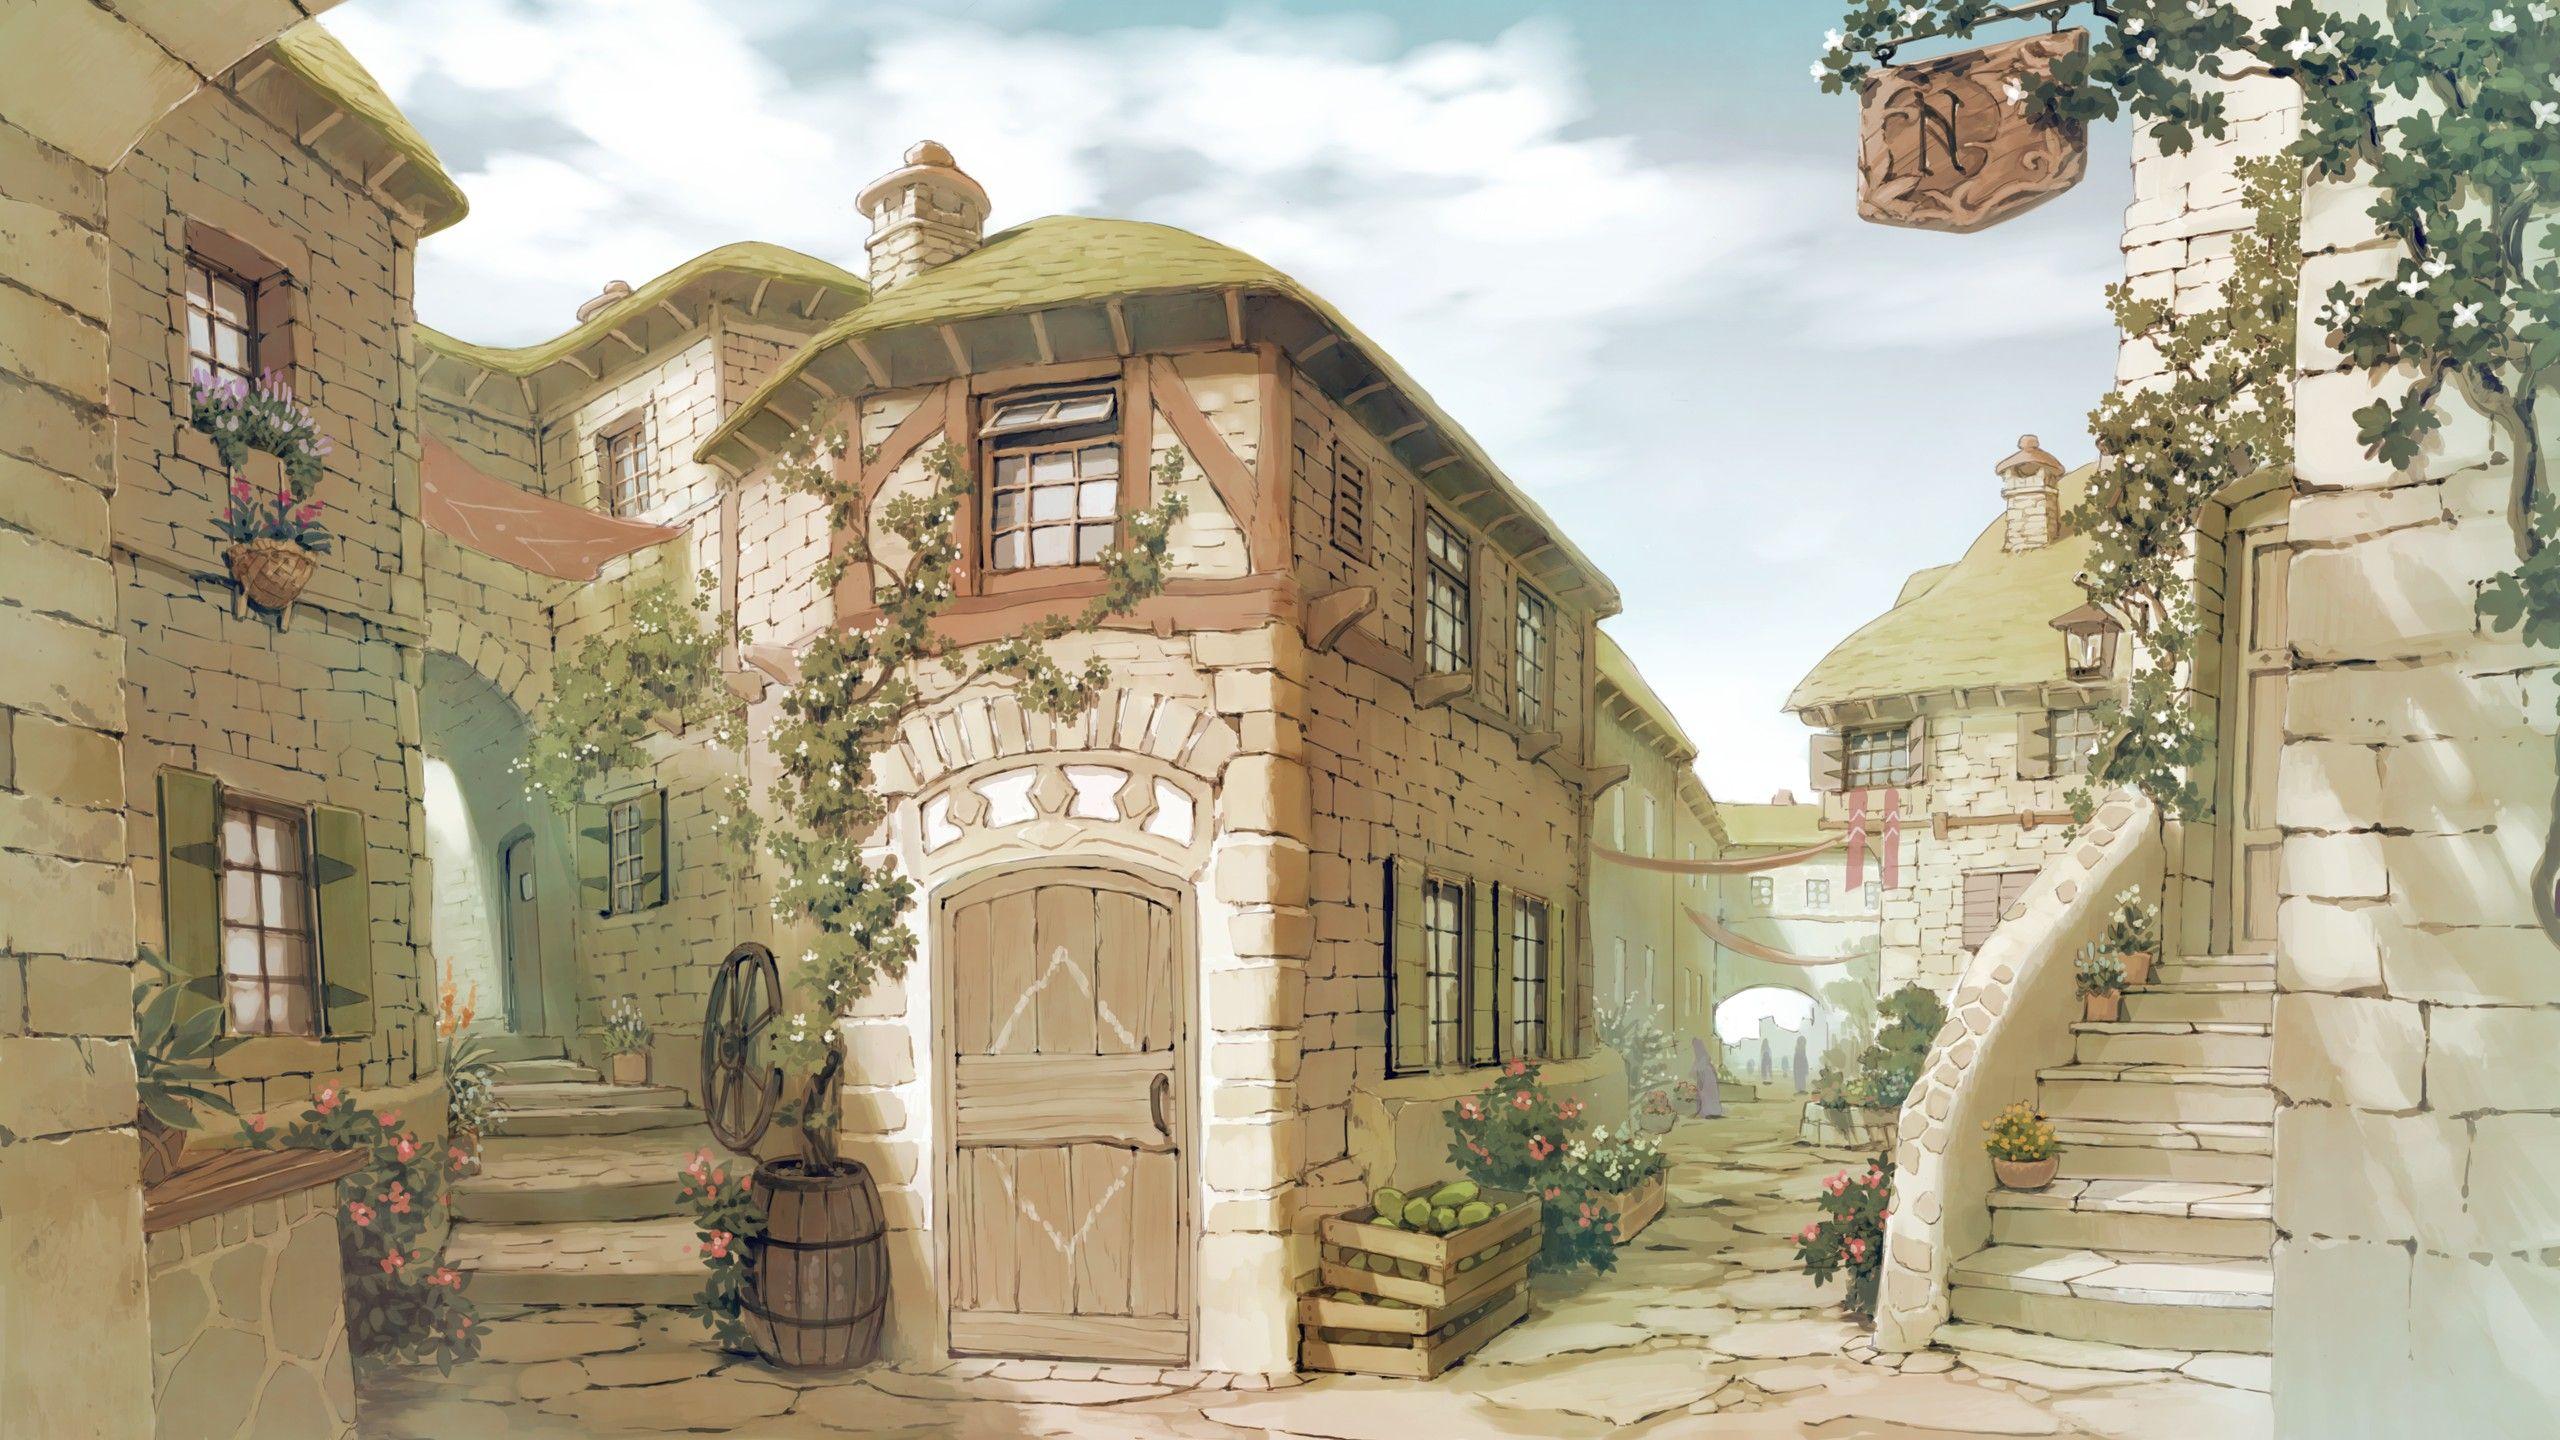 Atelier Meruru Wallpaper Hd Wallpapers (High Definition